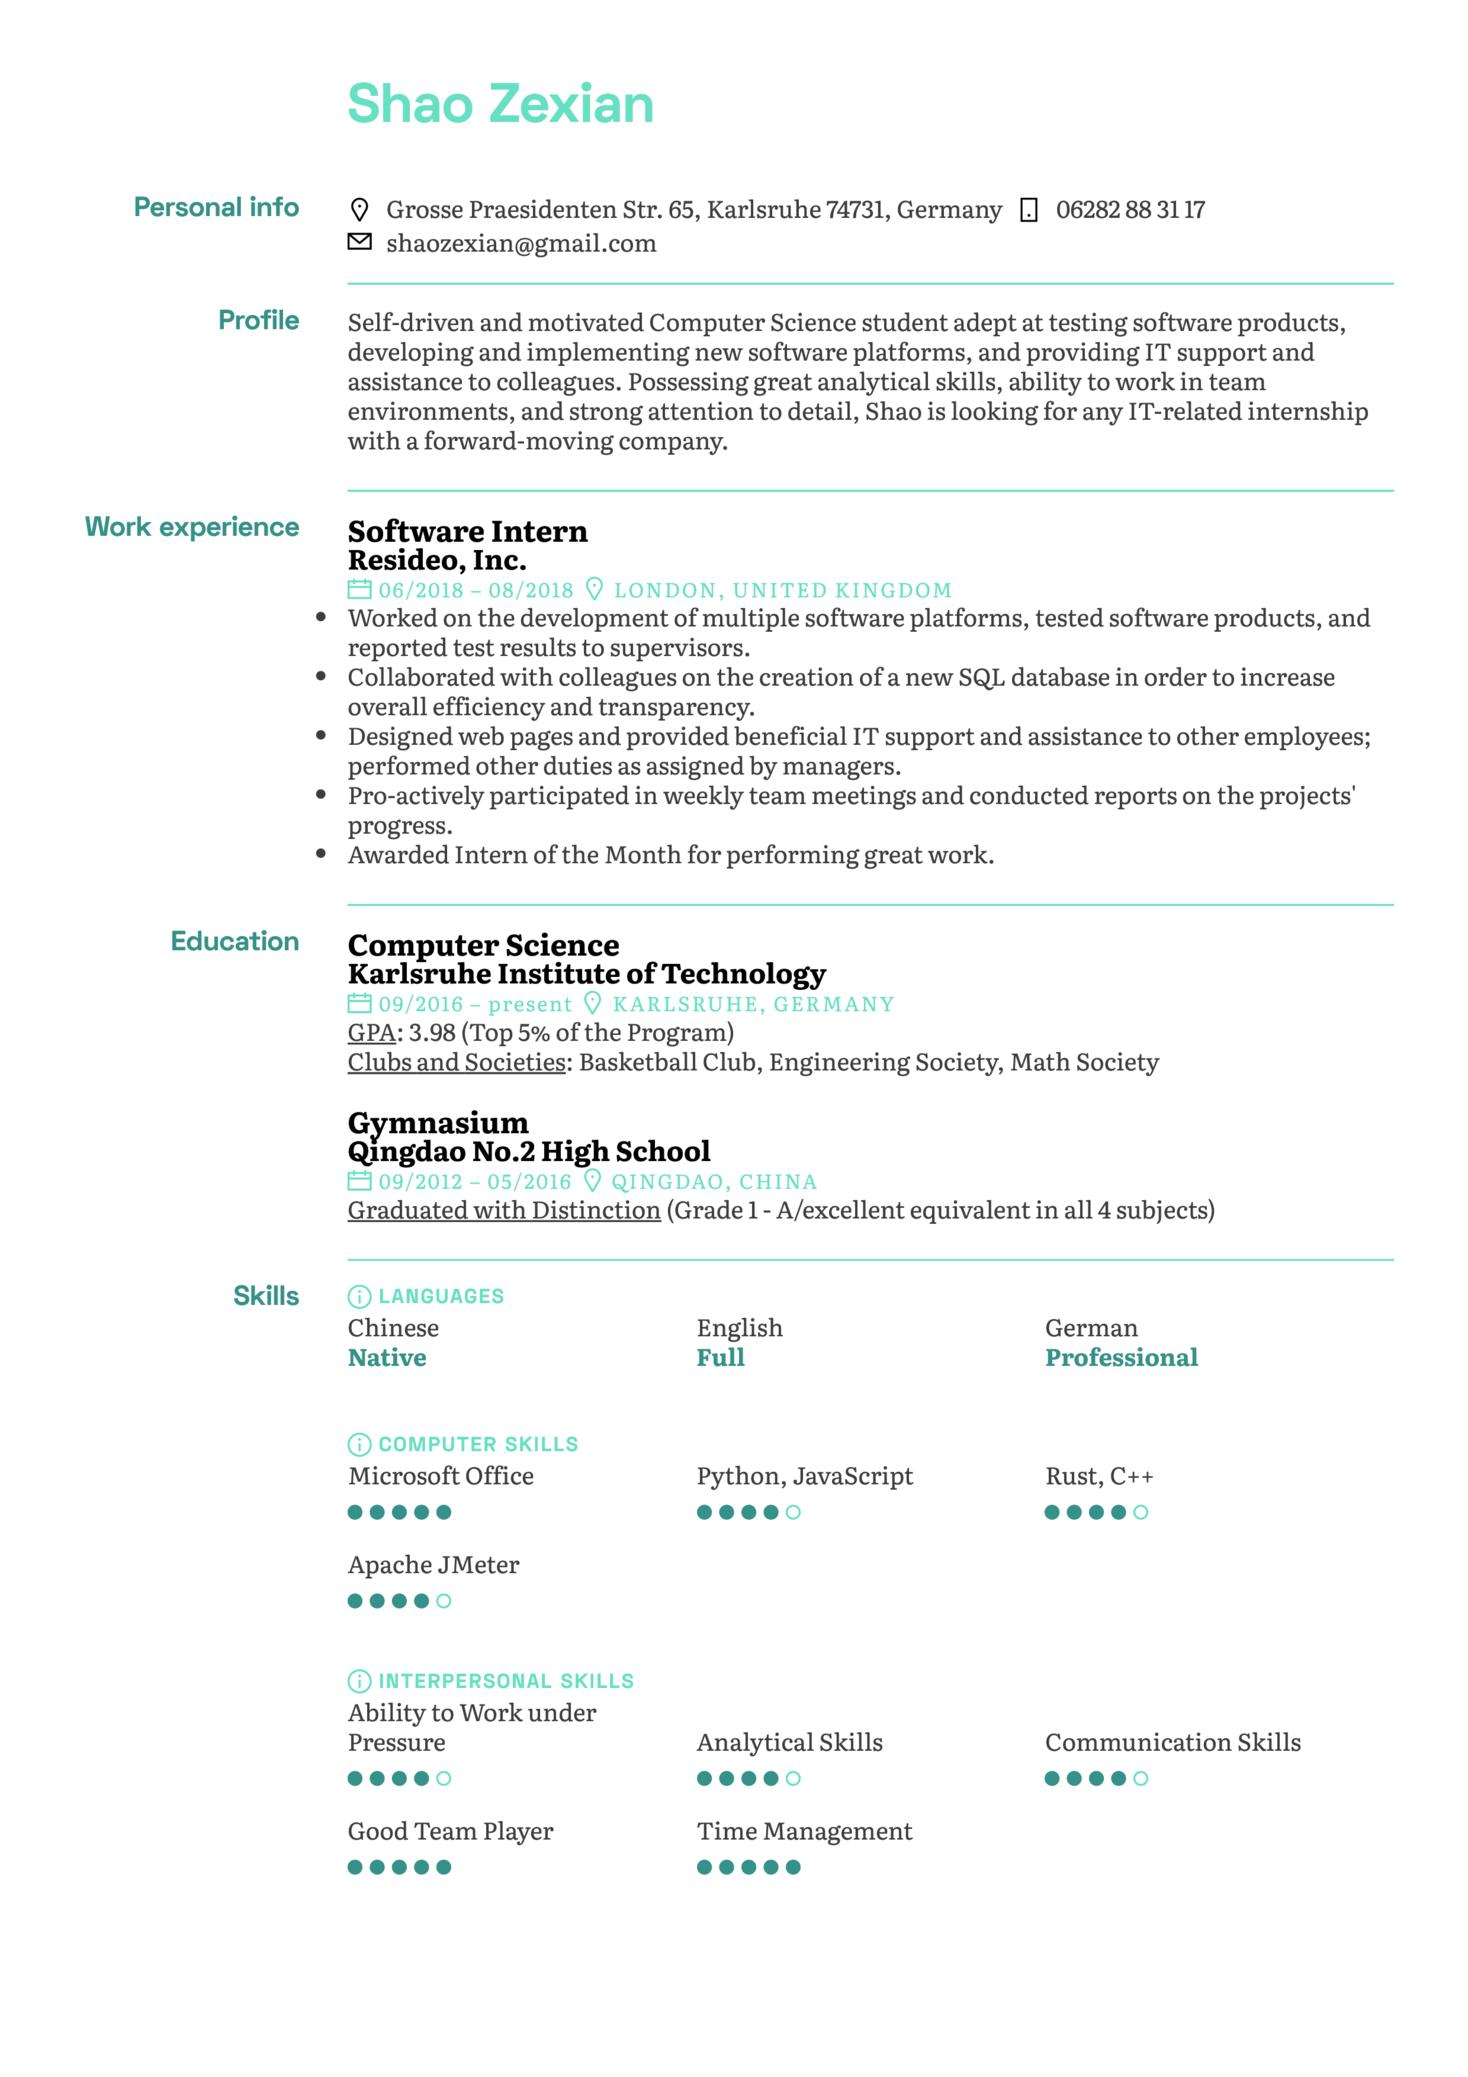 Software Intern Resume Template (Teil 1)